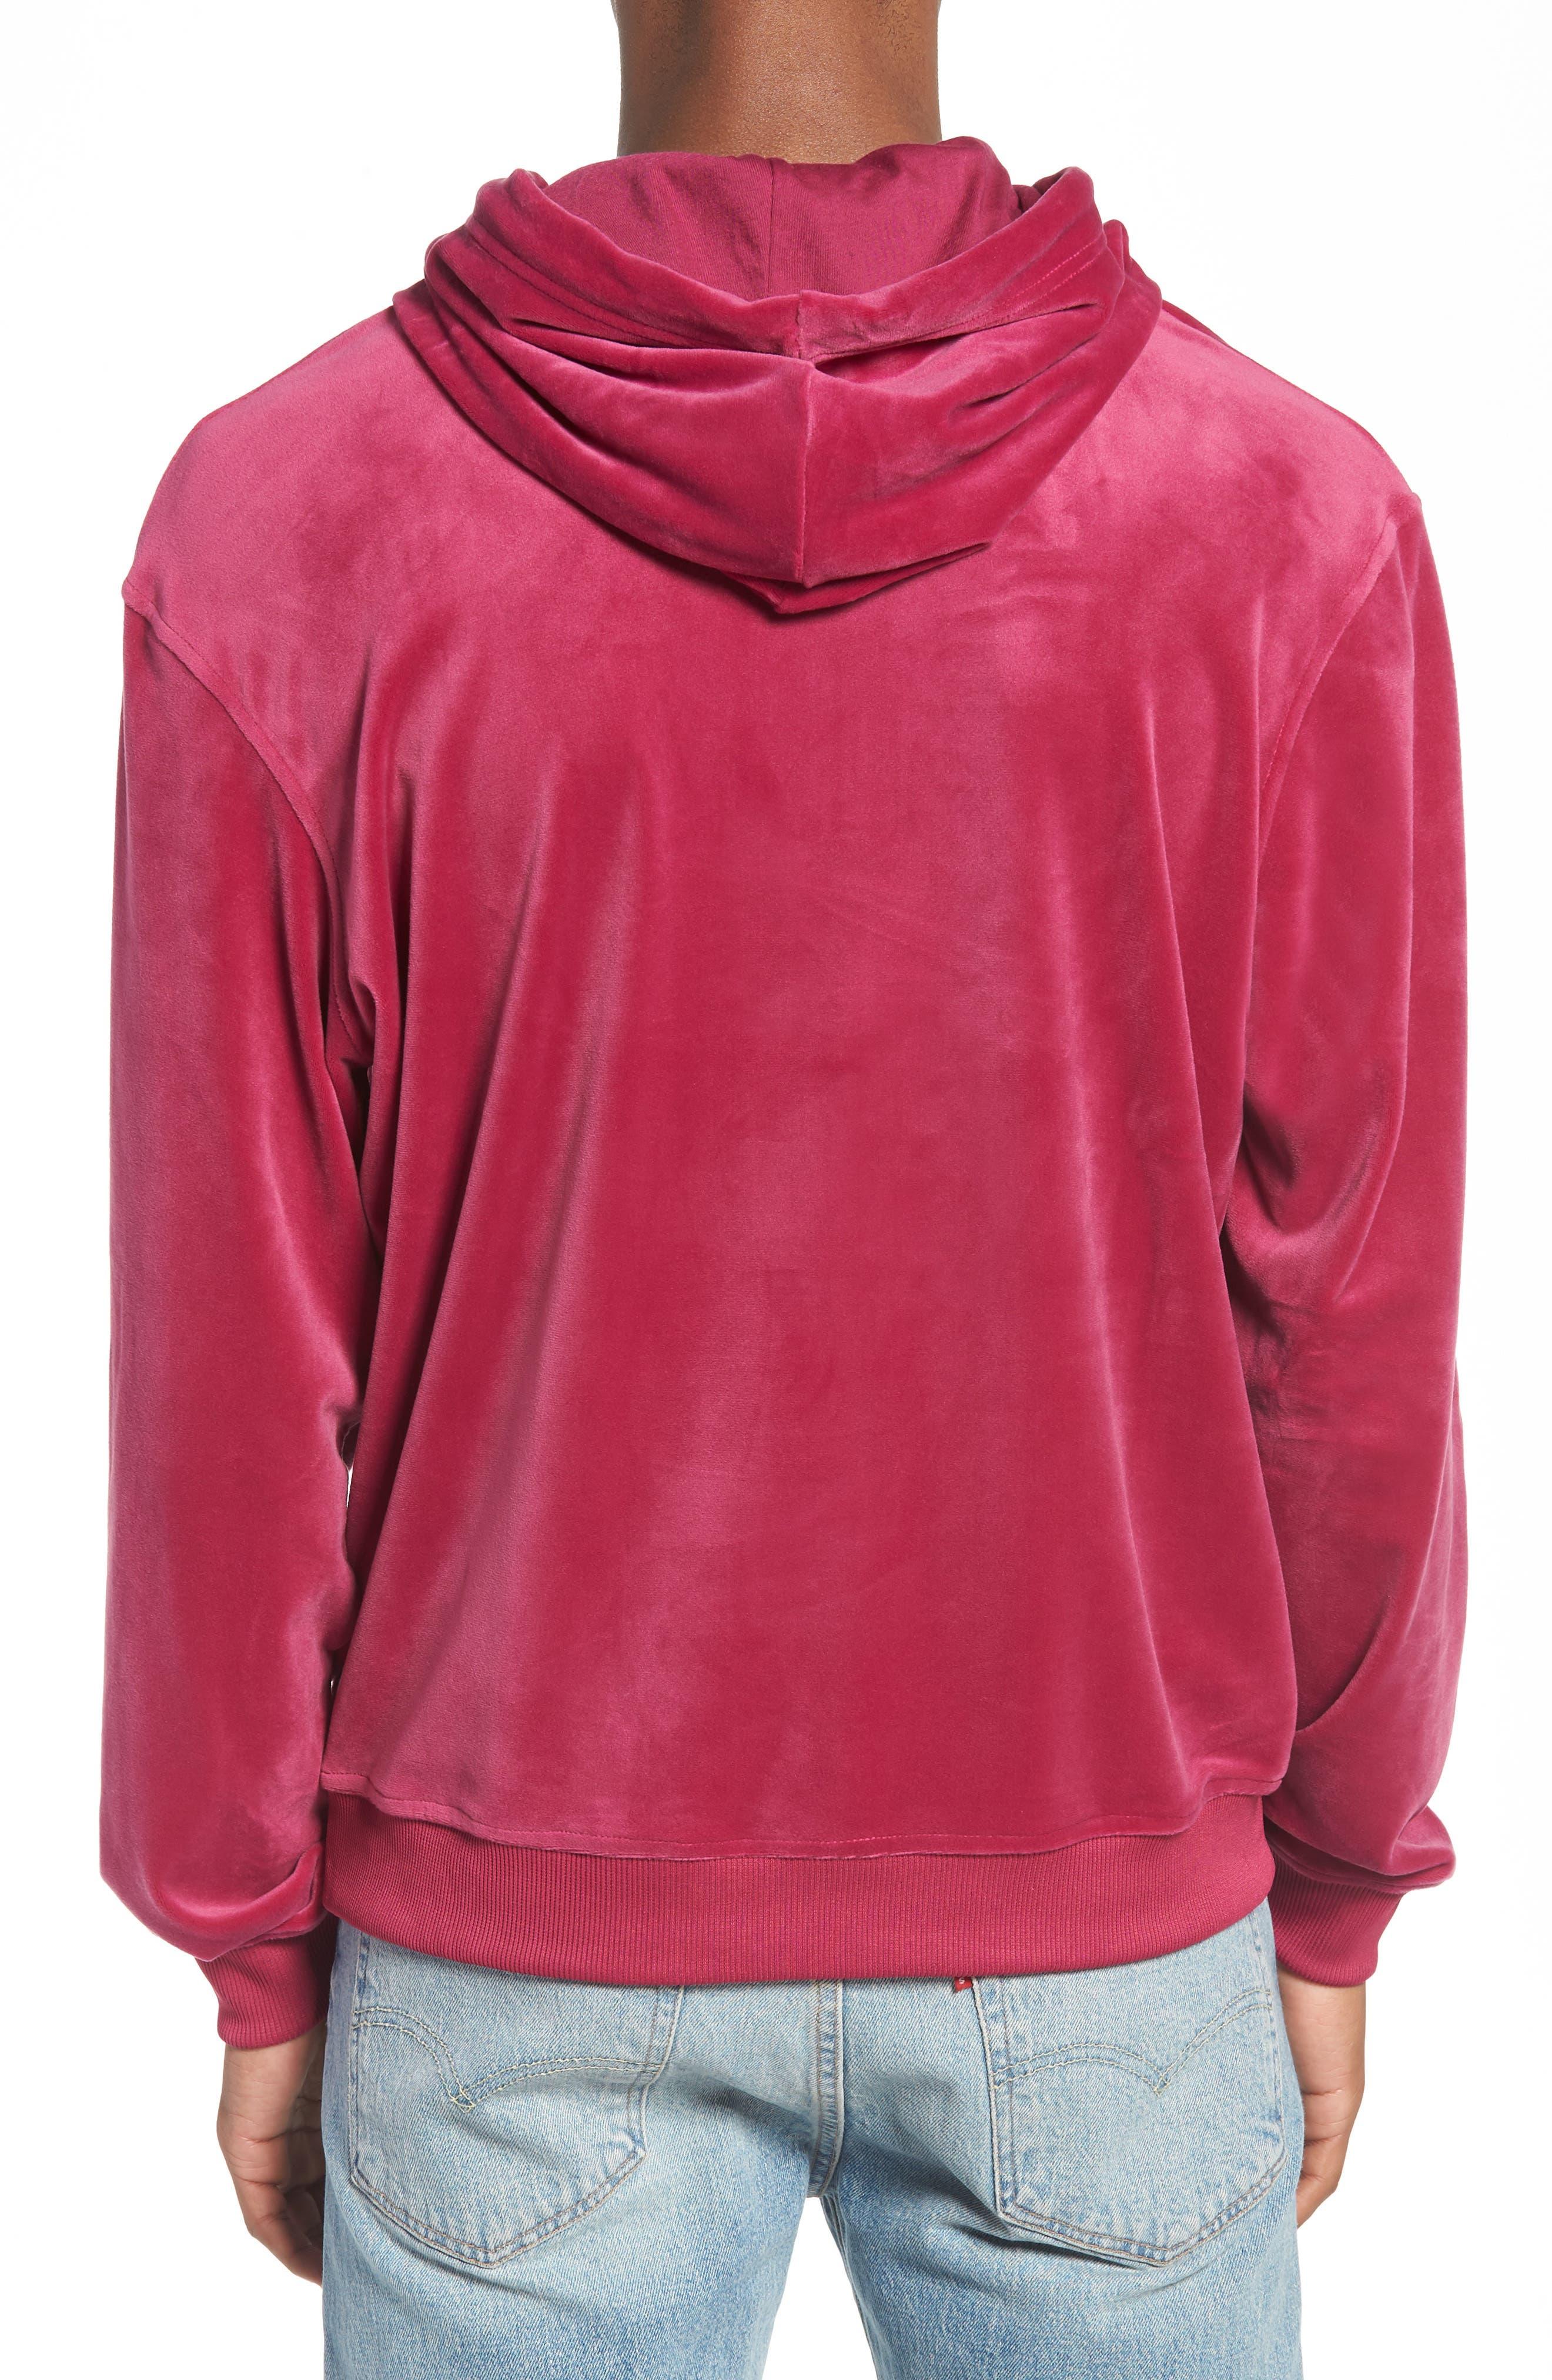 Asher Velour Hoodie Sweatshirt,                             Alternate thumbnail 2, color,                             Rasberry Radiance